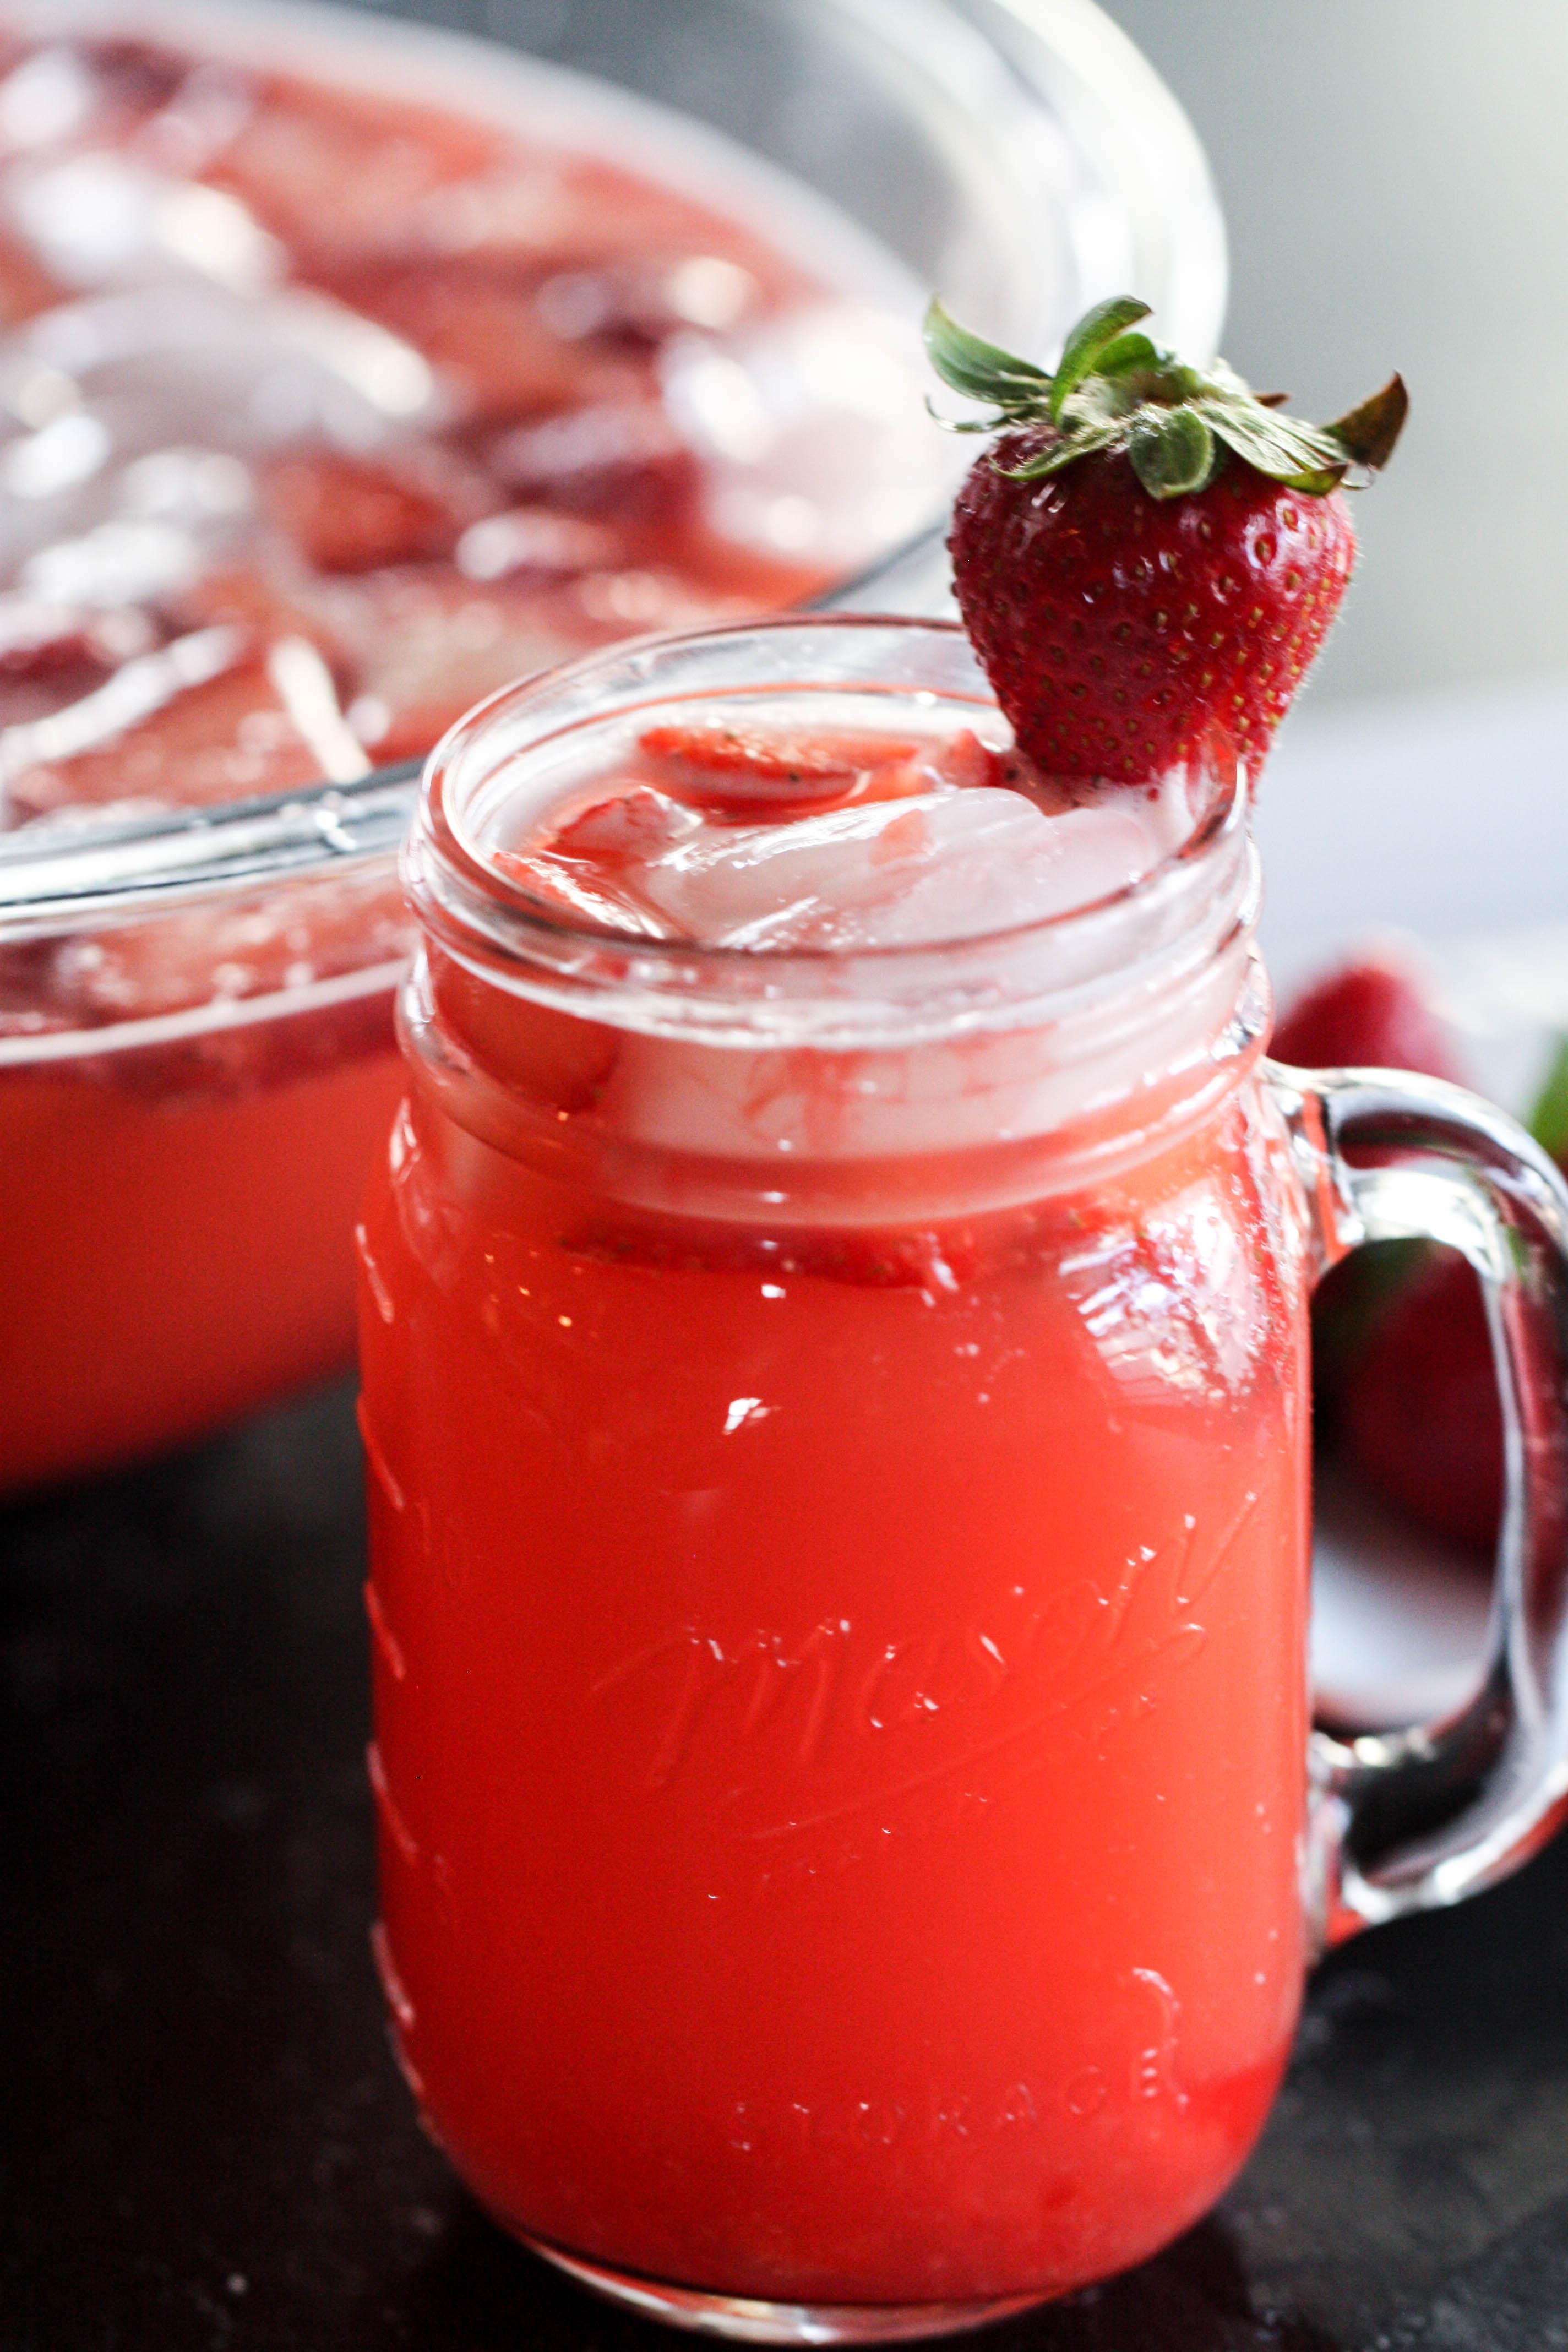 Strawberry Slush Drink in a glass mason jar topped with a fresh strawberry